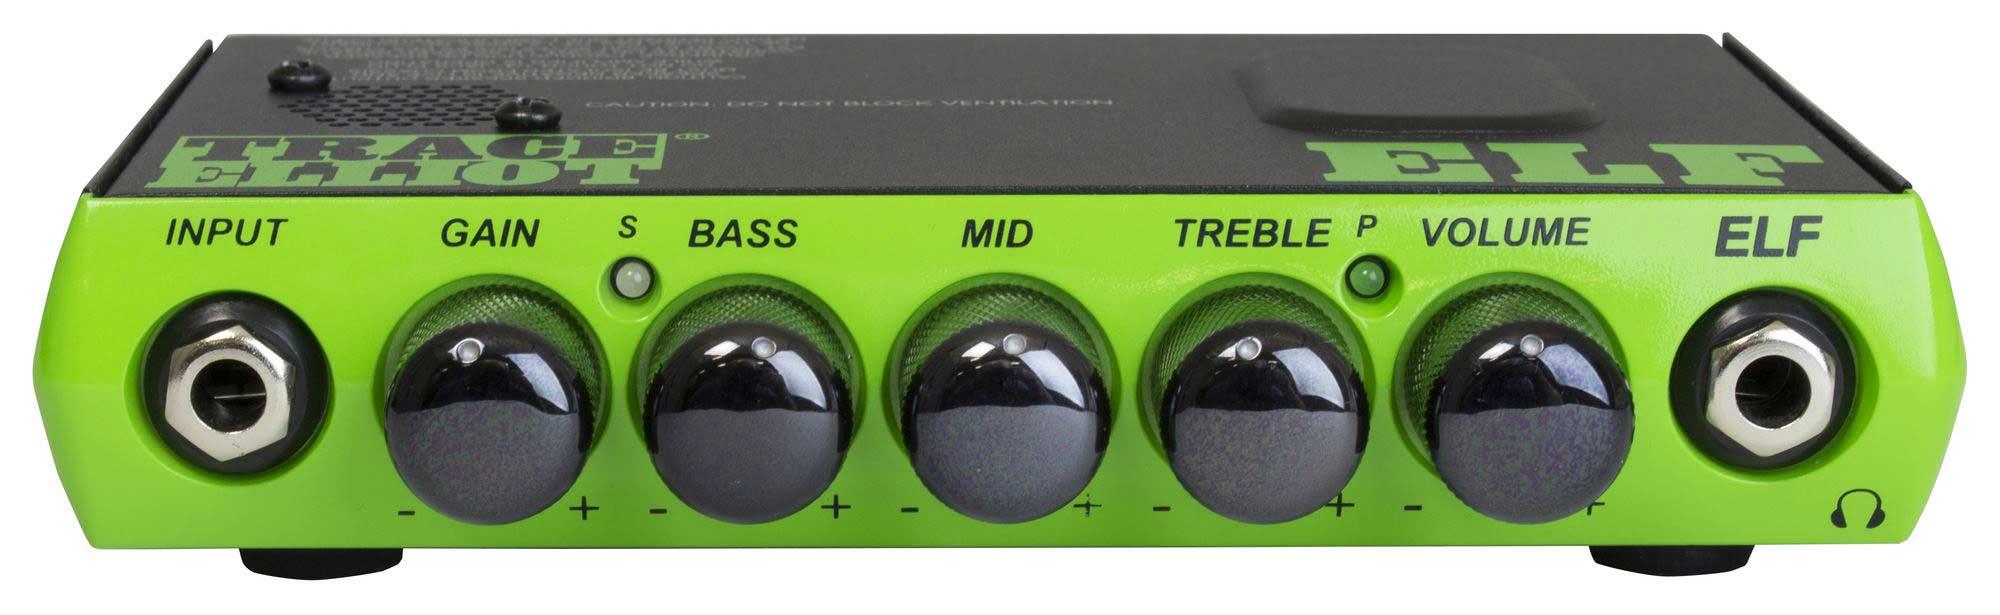 Trace Elliot Bass Amps